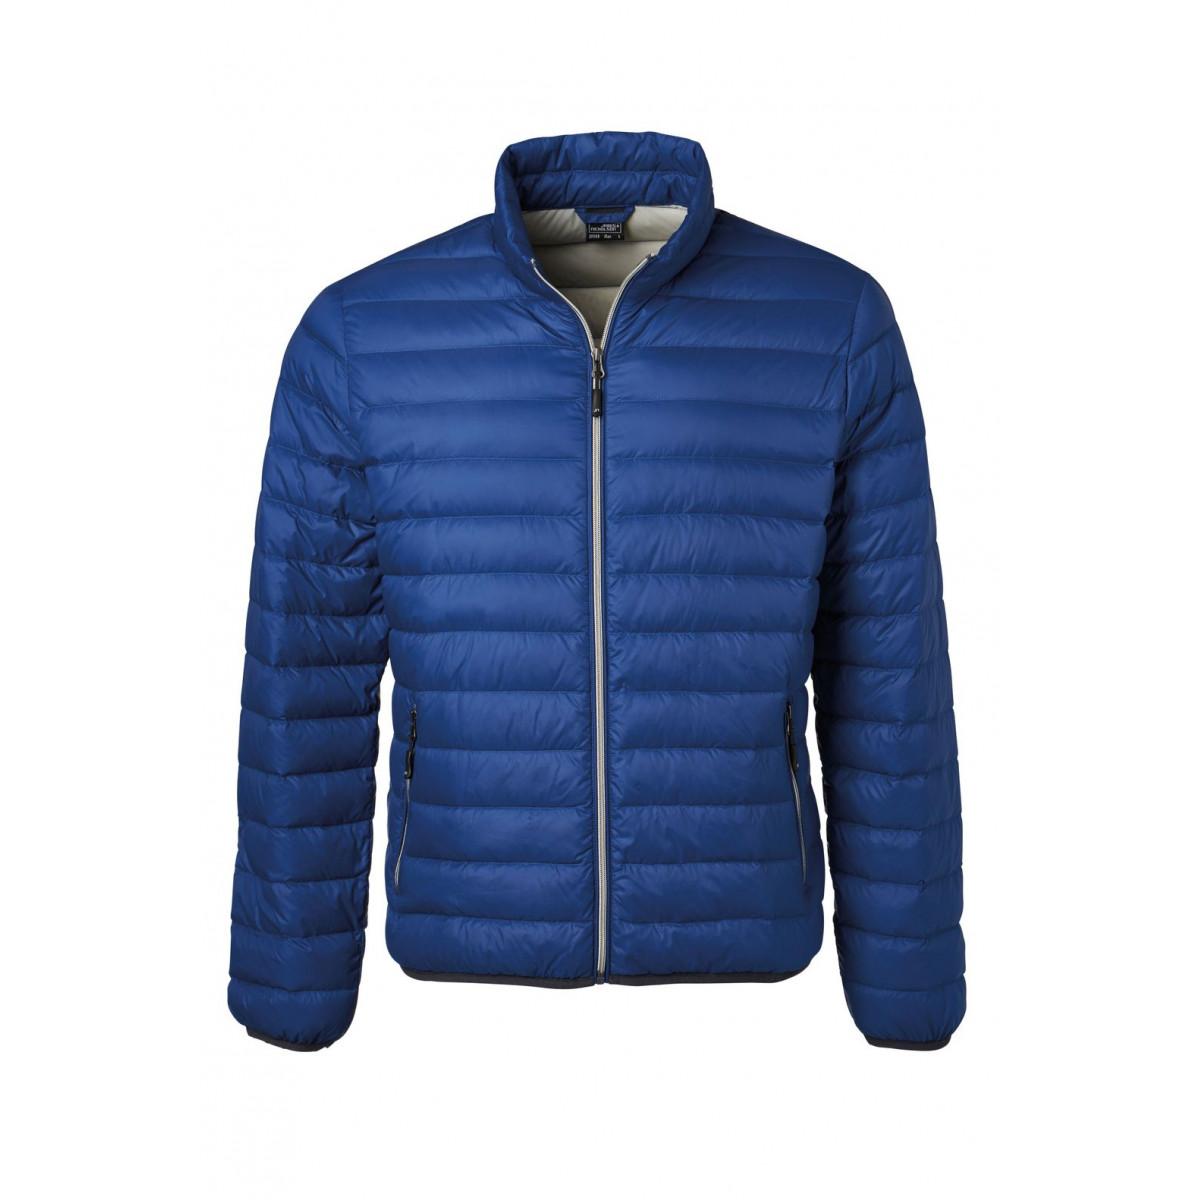 Куртка мужская JN1140 Mens Down Jacket - Темно-синий/Серебряный